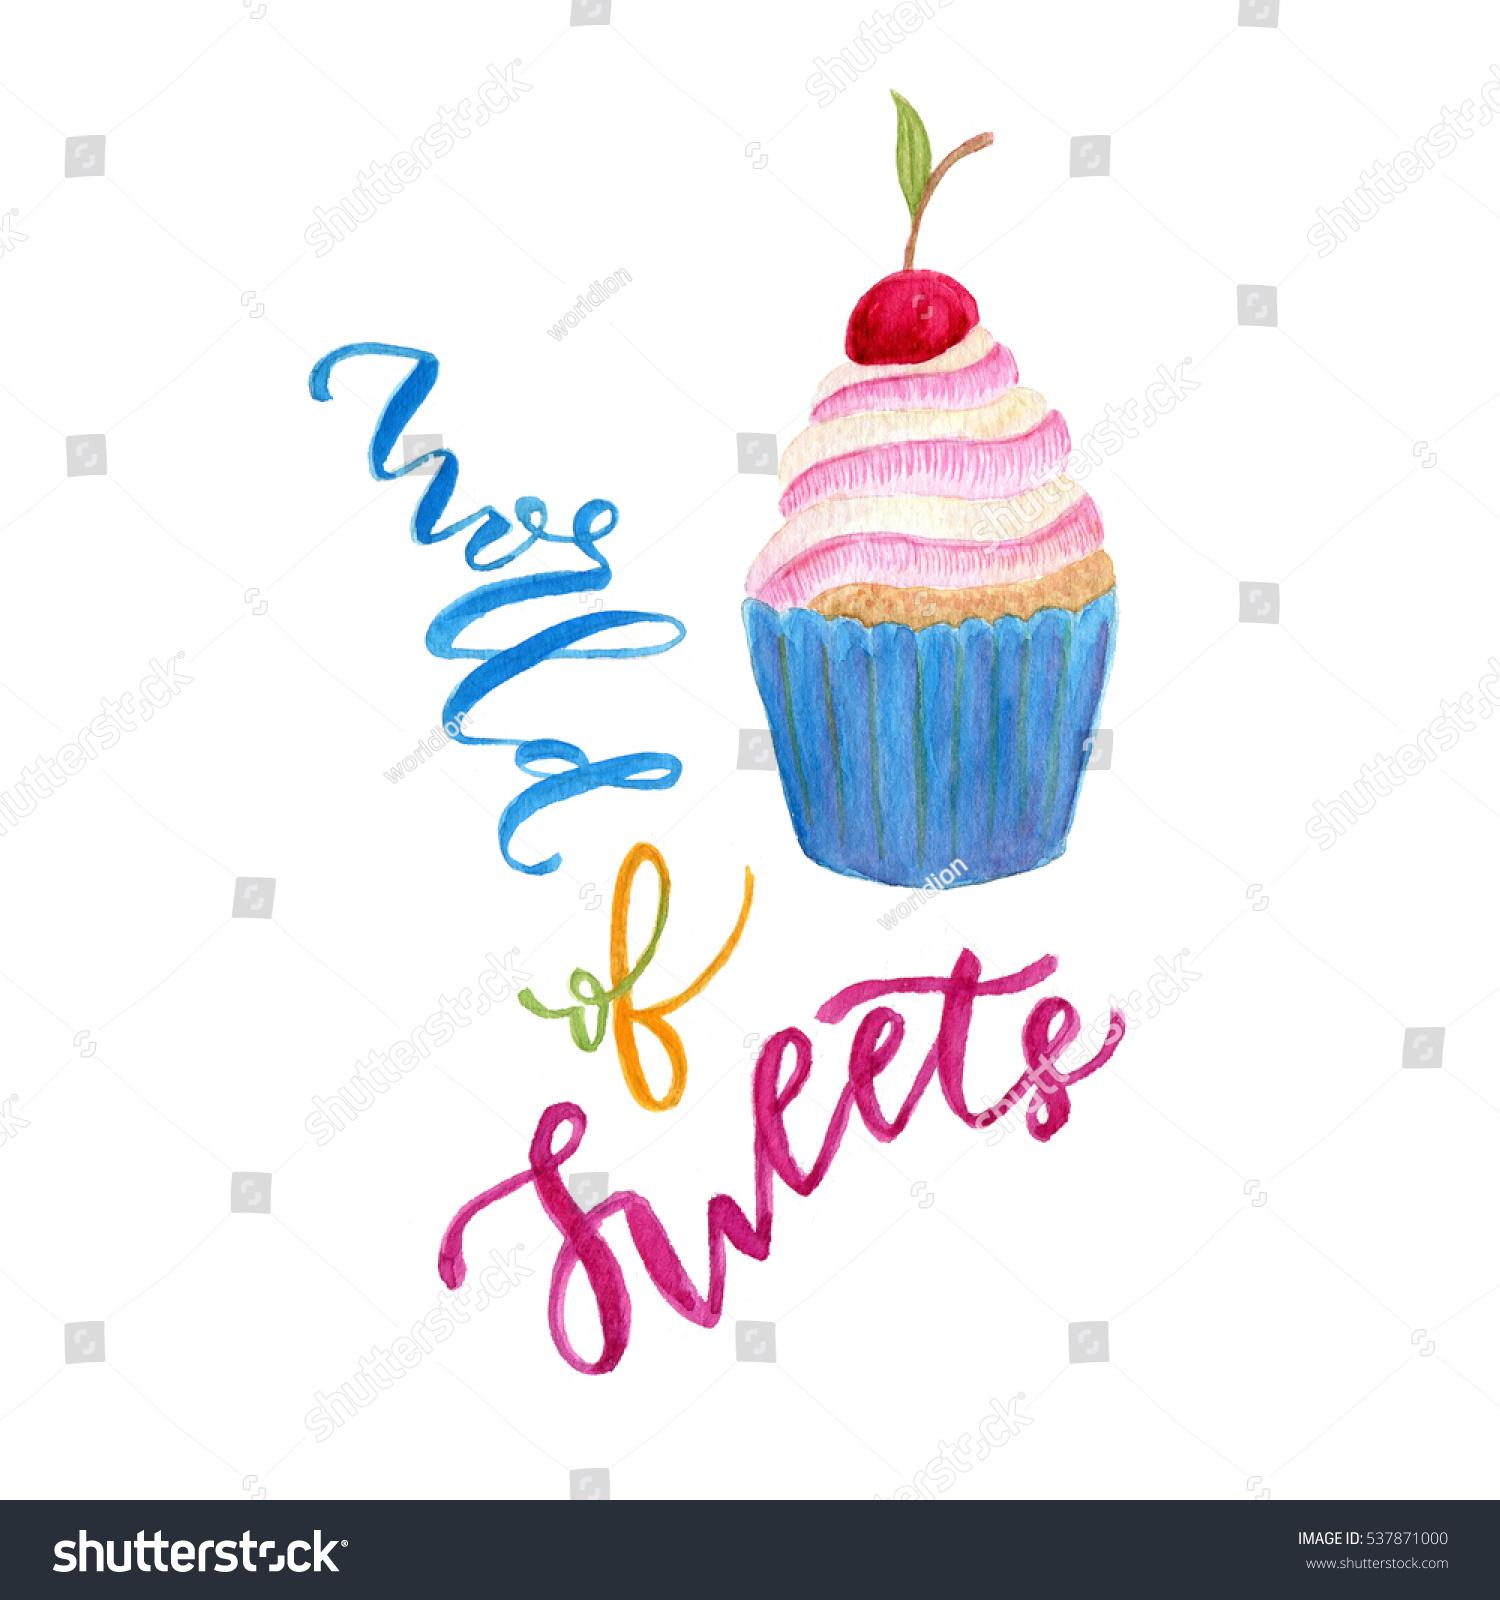 Watercolor Cupcake Illustration Sweet Art Greeting Stock